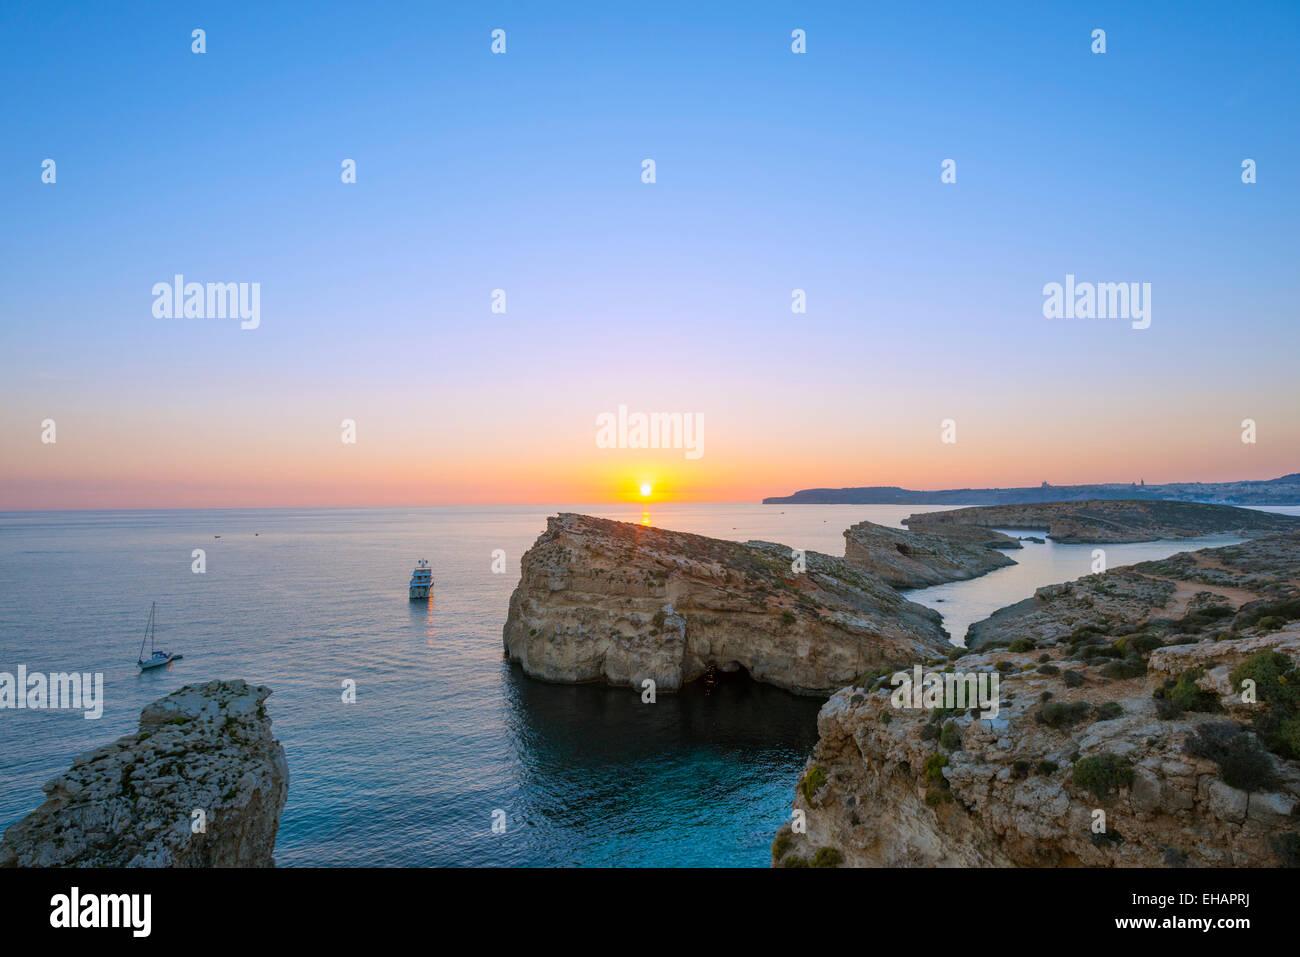 Mittelmeer Europa, Malta, Comino Insel, Sonnenuntergang Stockbild